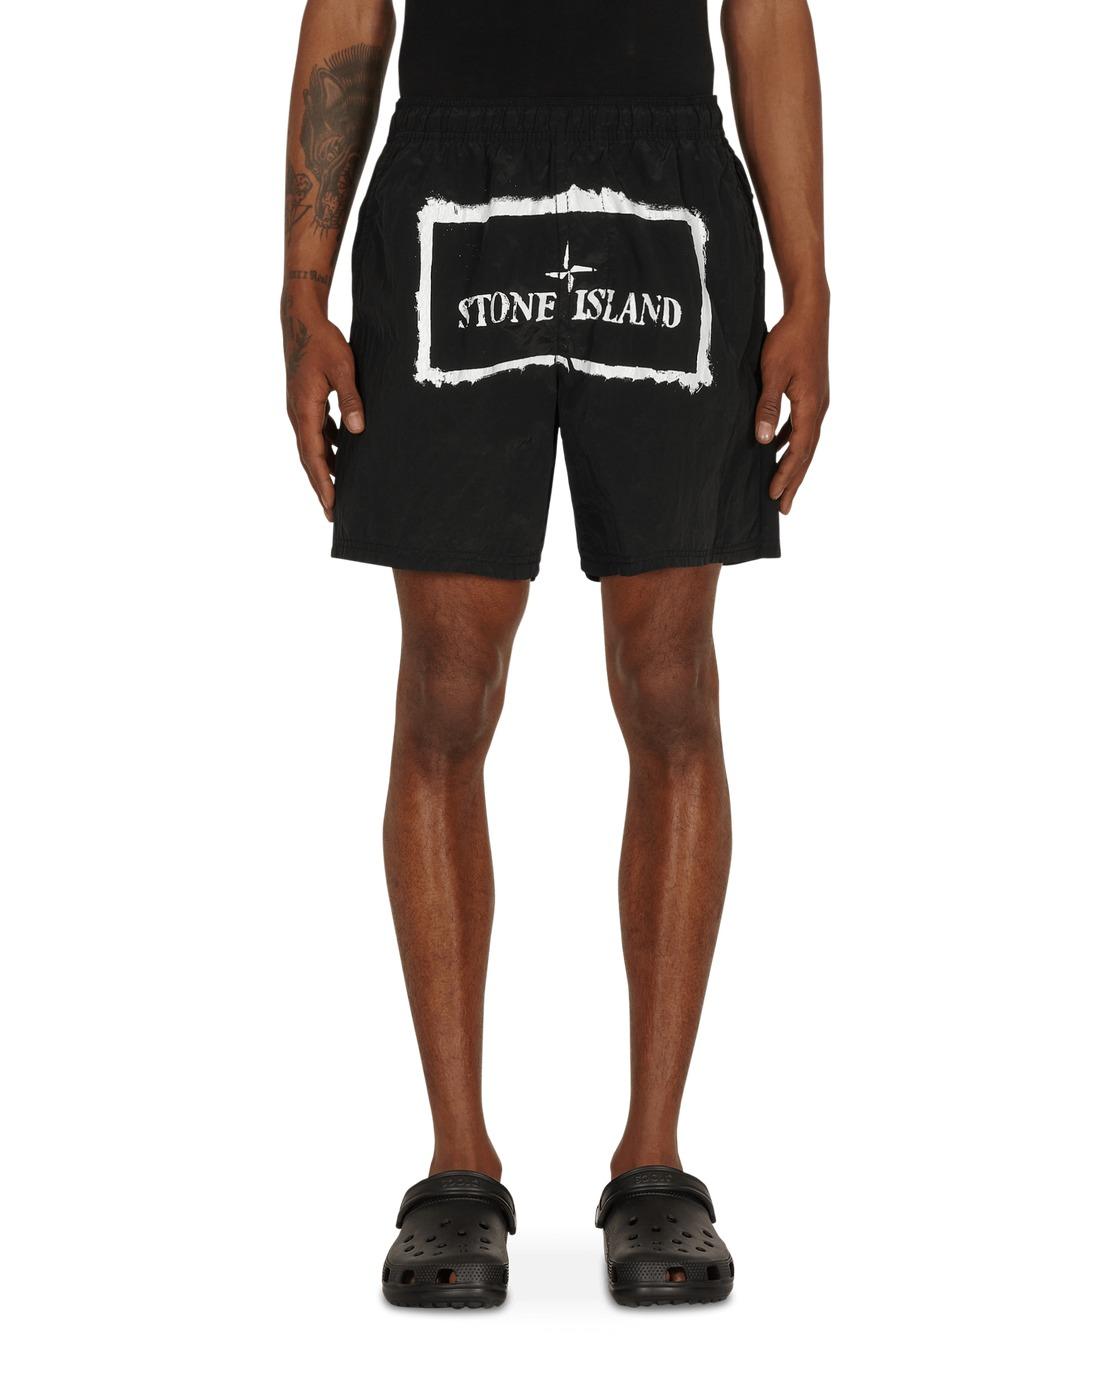 Stone Island Nylon Metal Stencil Print Swim Shorts Black